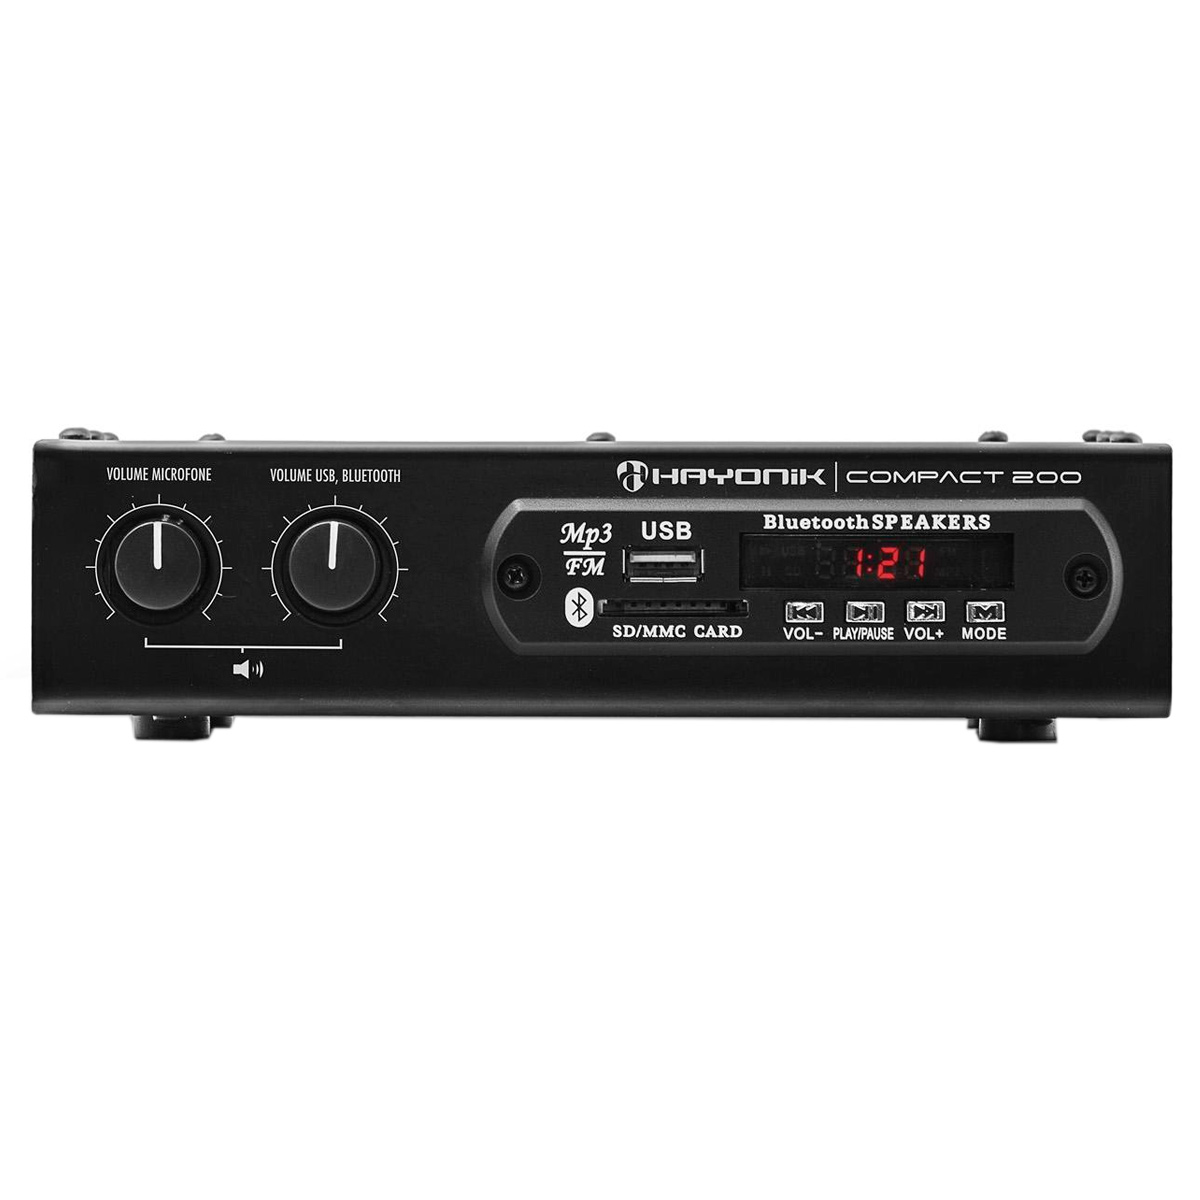 Amplificador Som Ambiente 20W até 2 Caixas c/ USB / Bluetooth - Compact 200 Hayonic